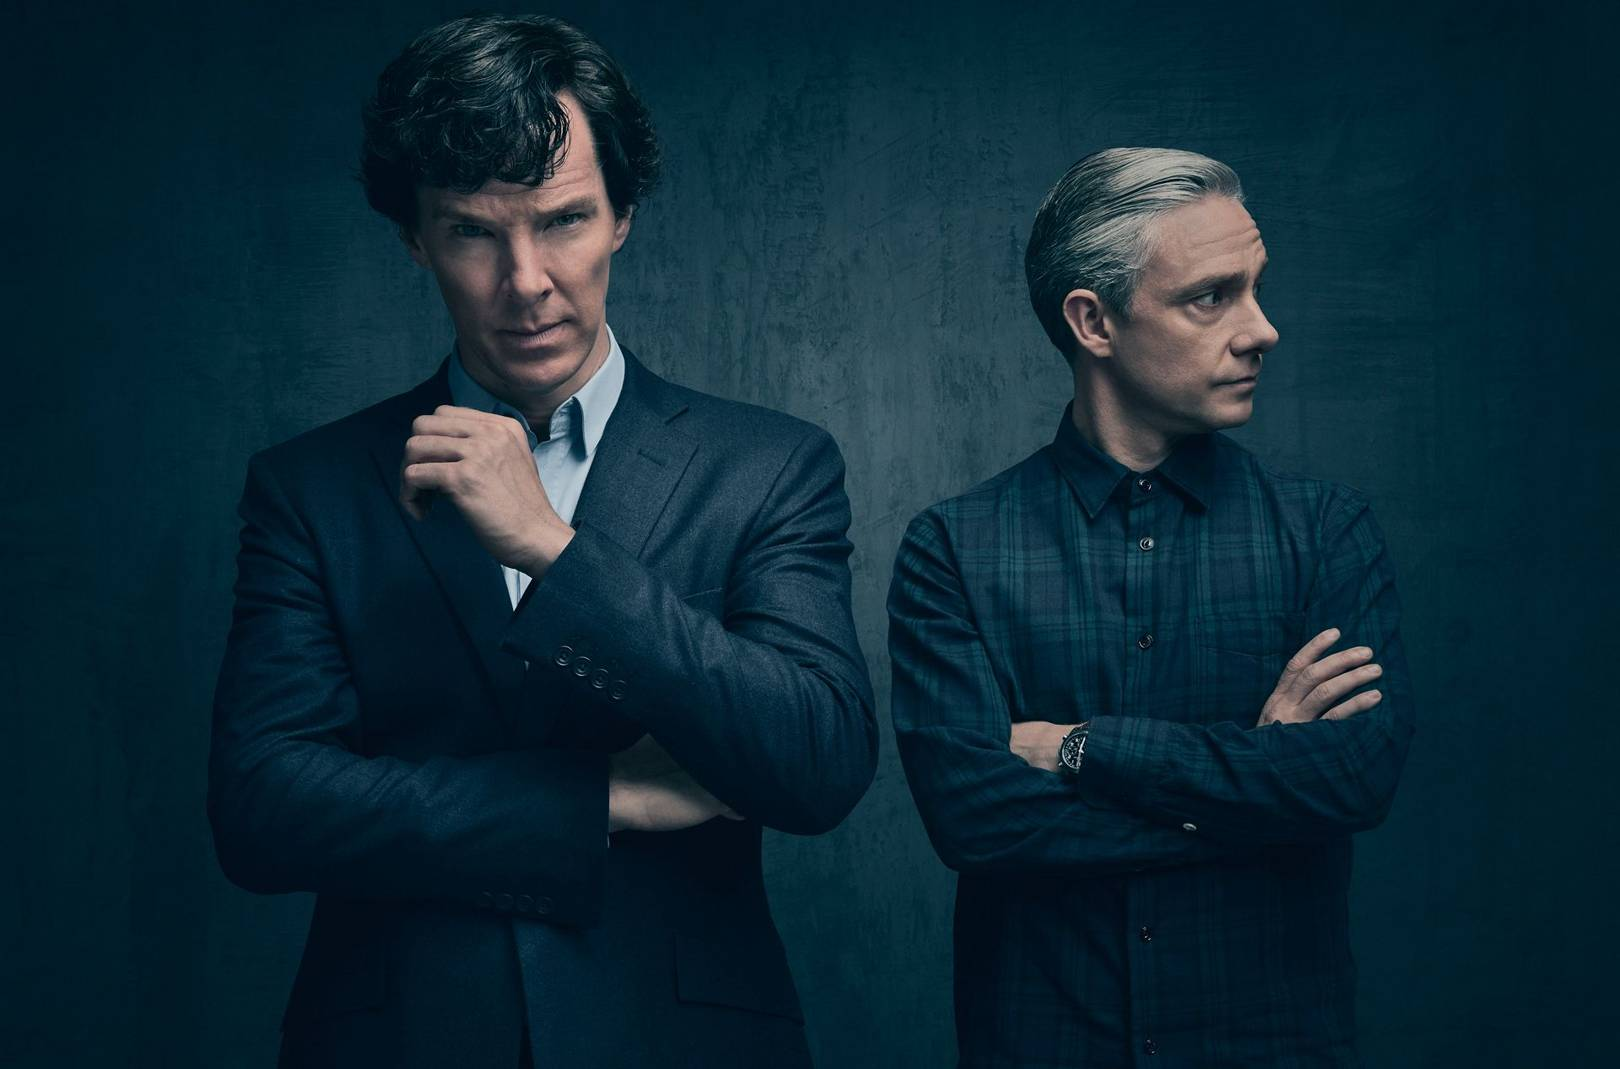 Benedict Cumberbatch Is Marvels Strangest Superhero British Gq Andrew Smith Classic Formal Shirt Cokelat S